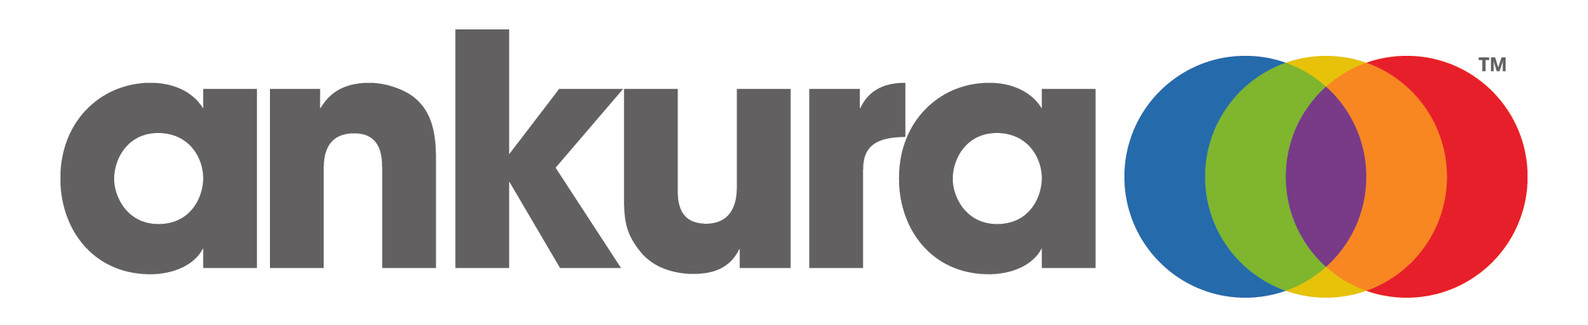 ankura_logo_cmyk.jpg